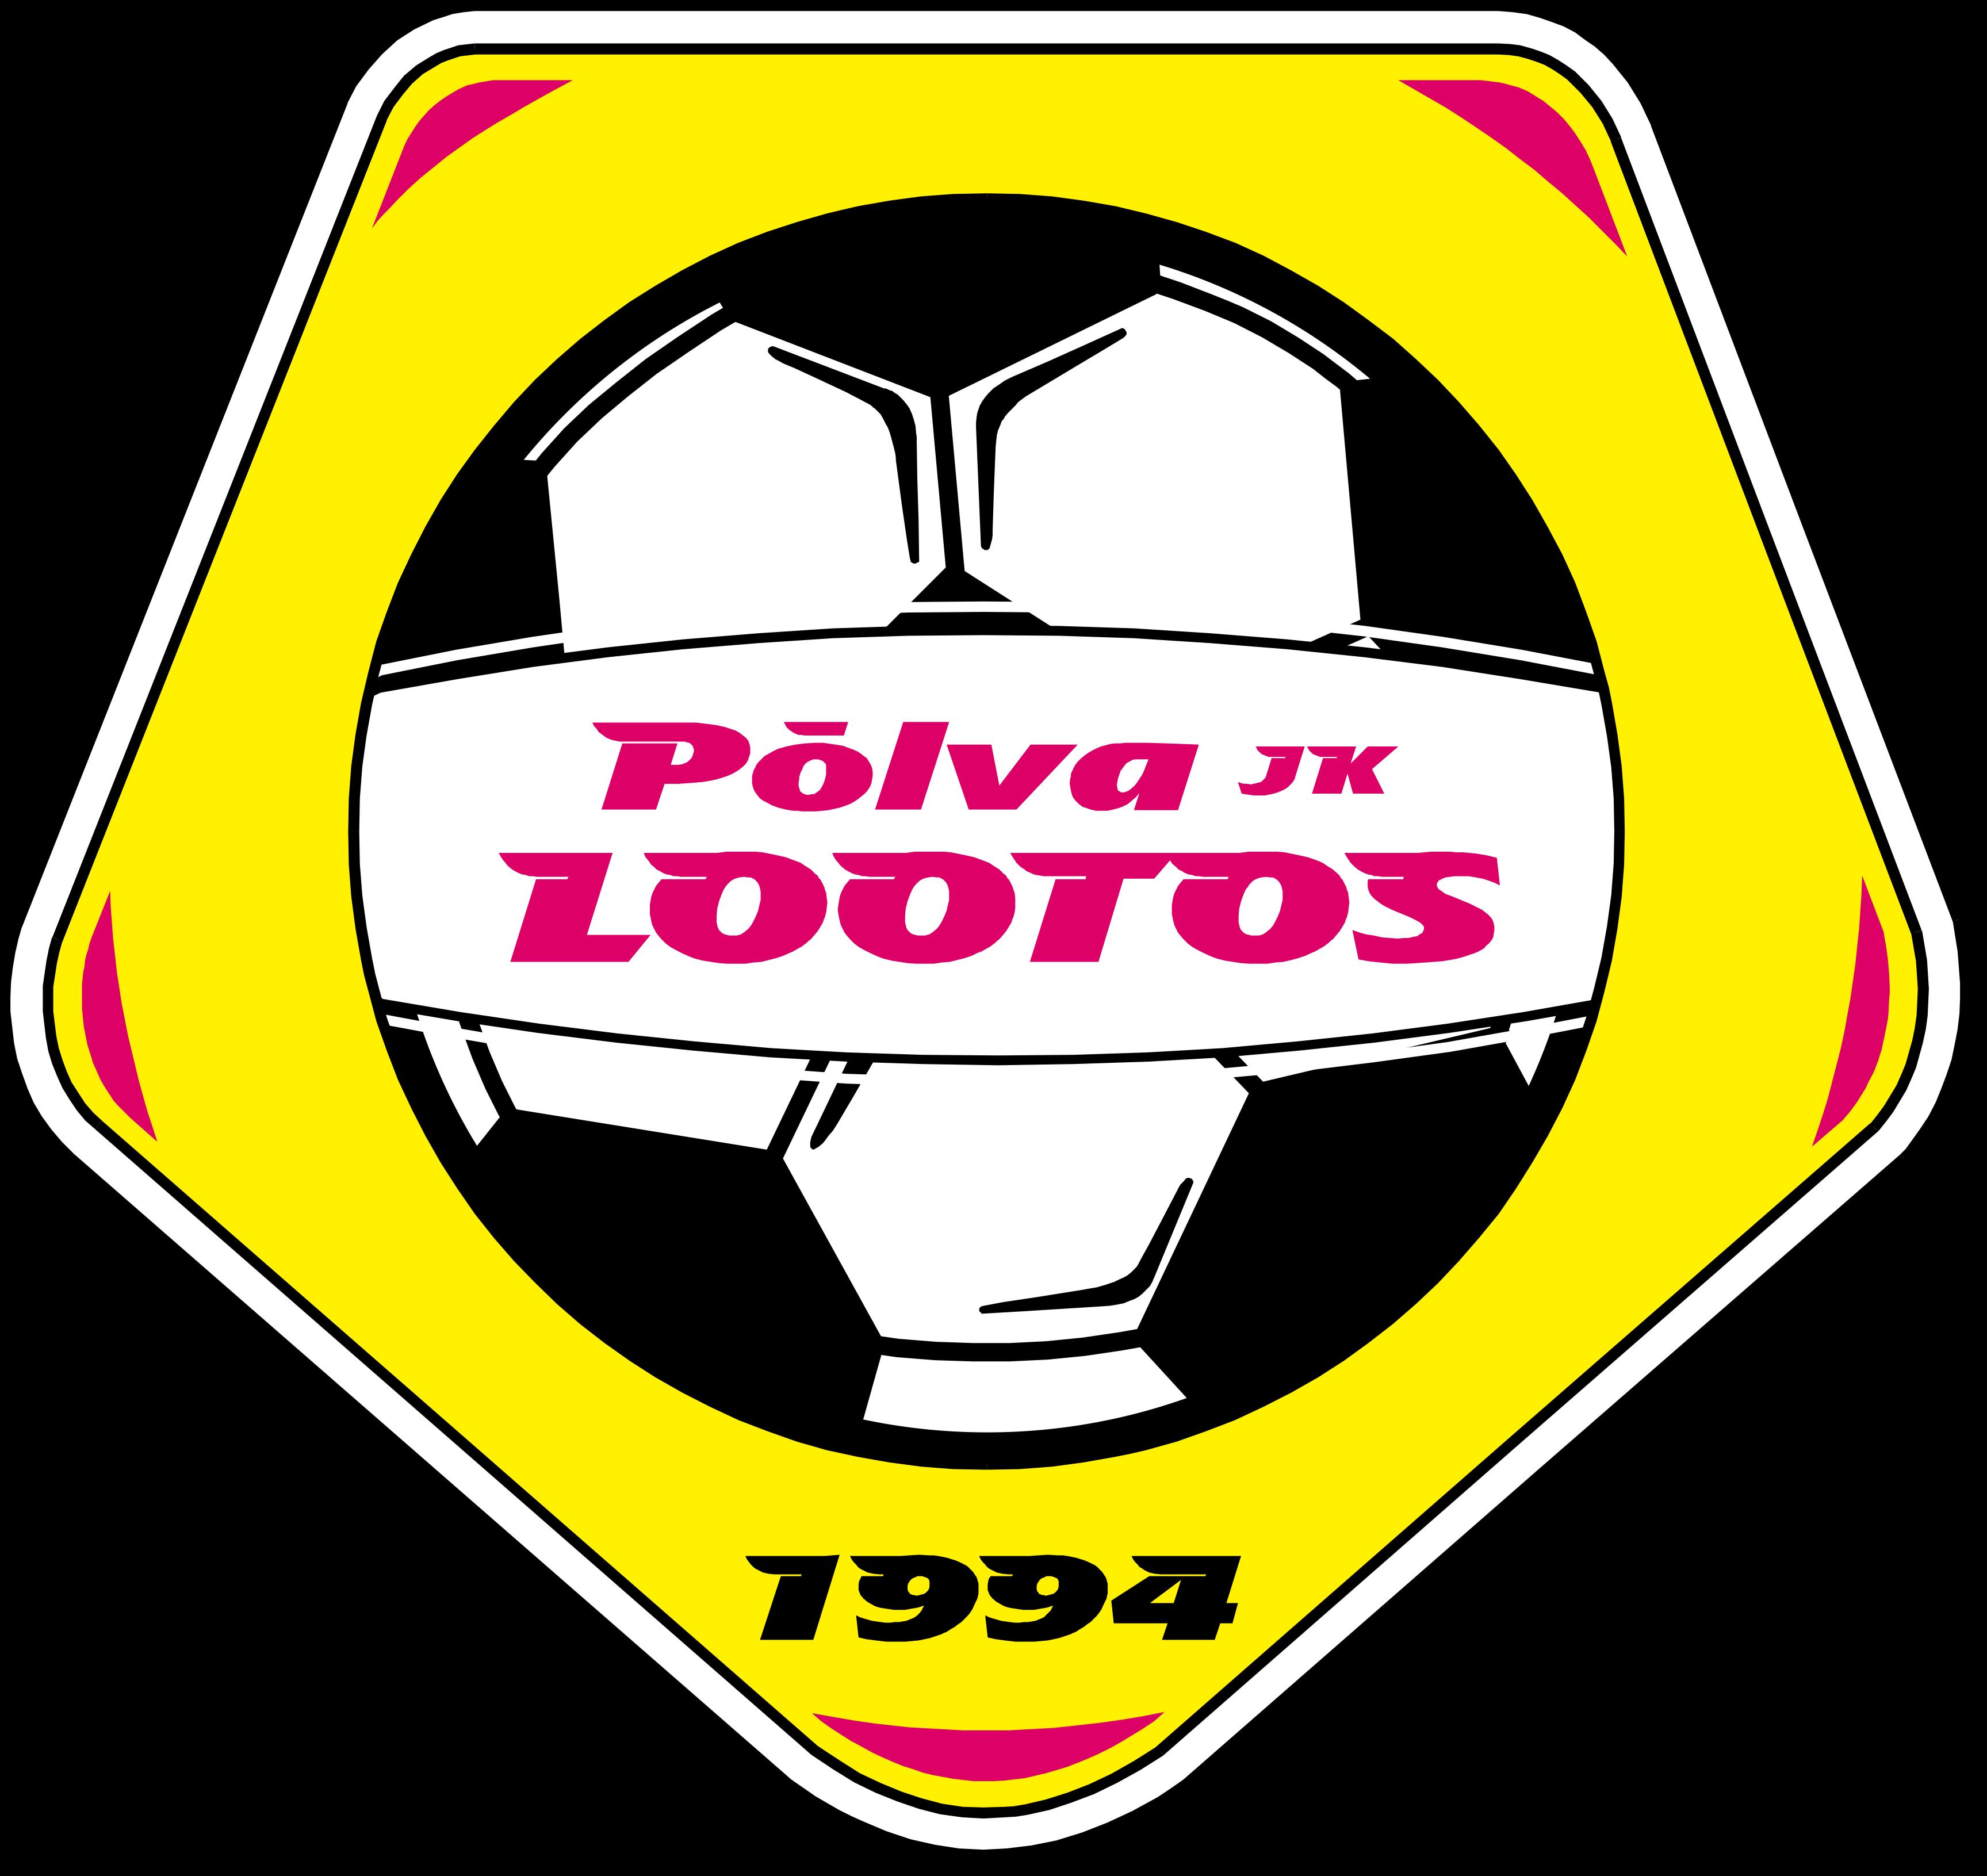 Põlva FC Lootos (T-99)